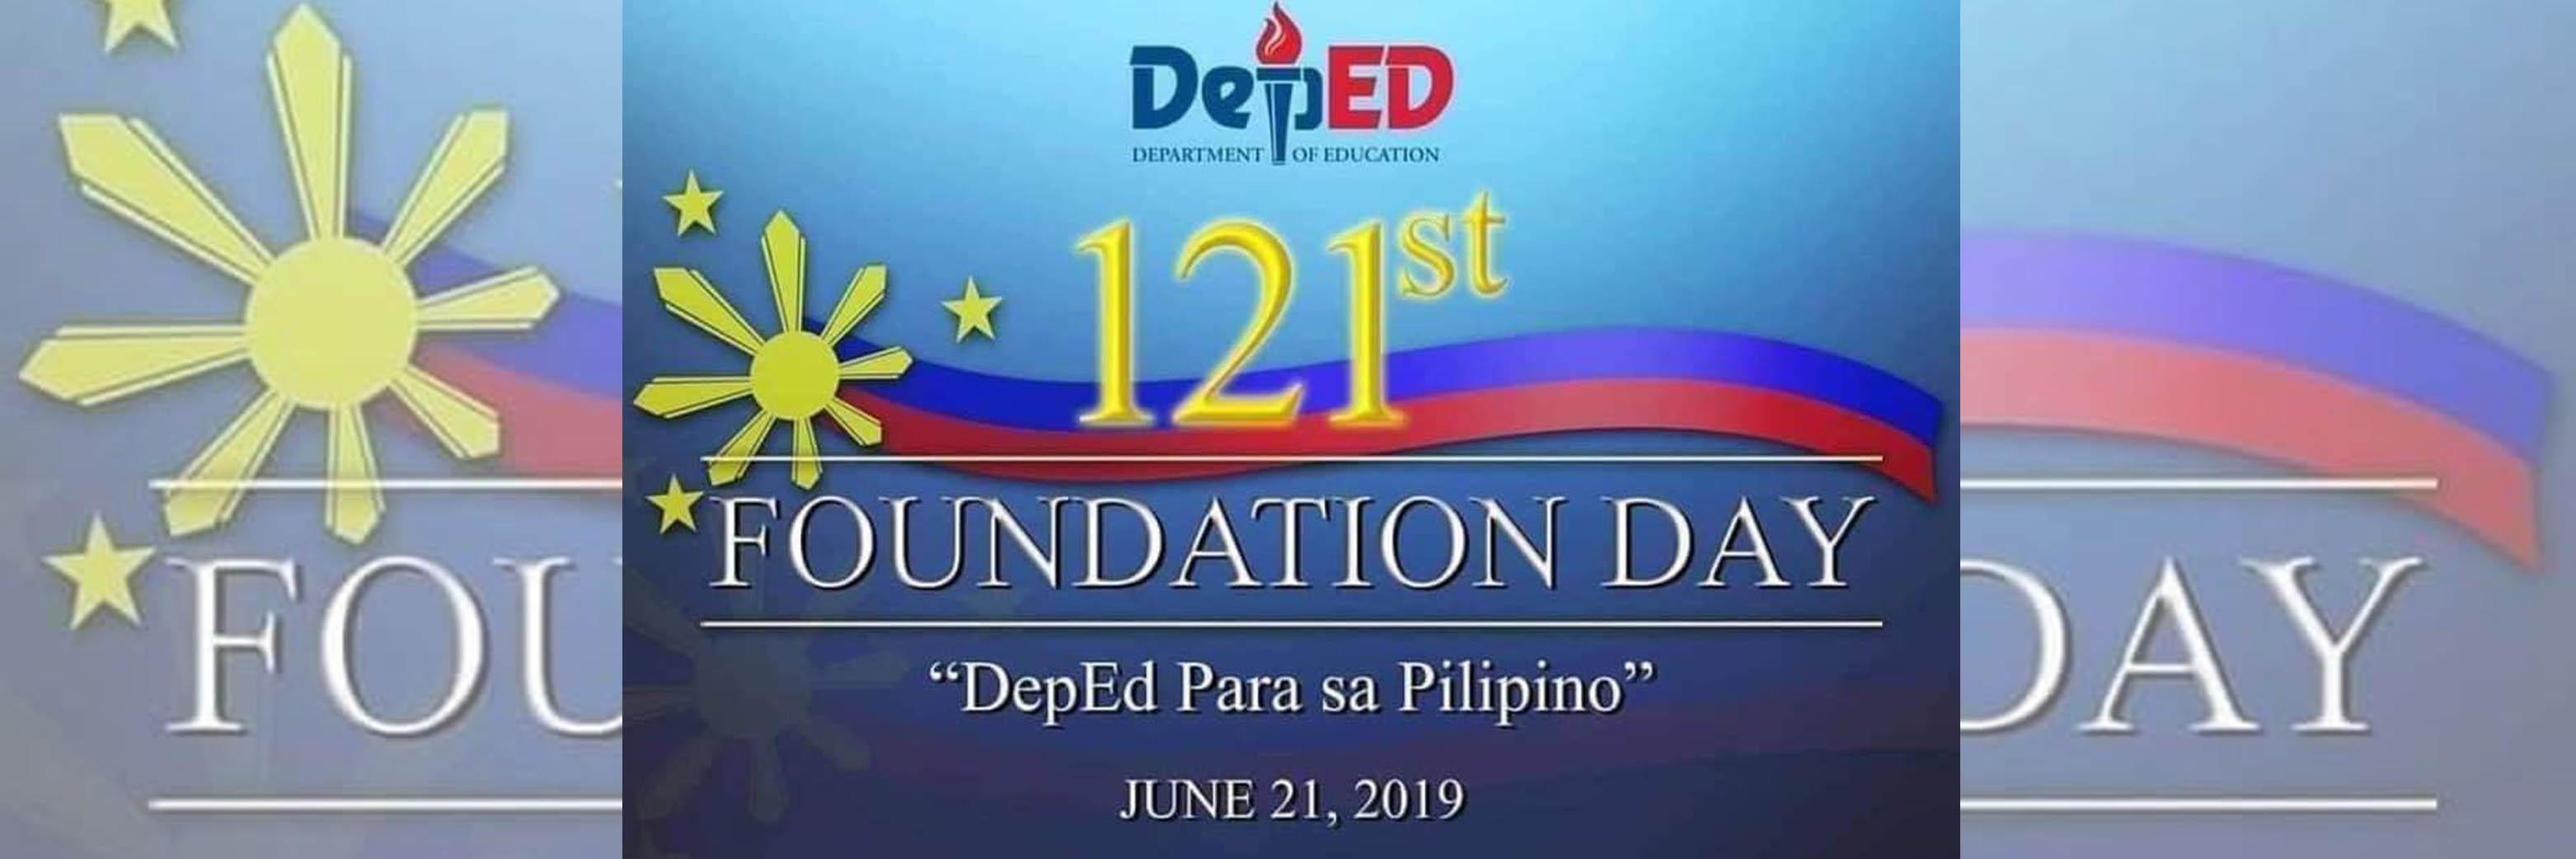 deped-foundationday